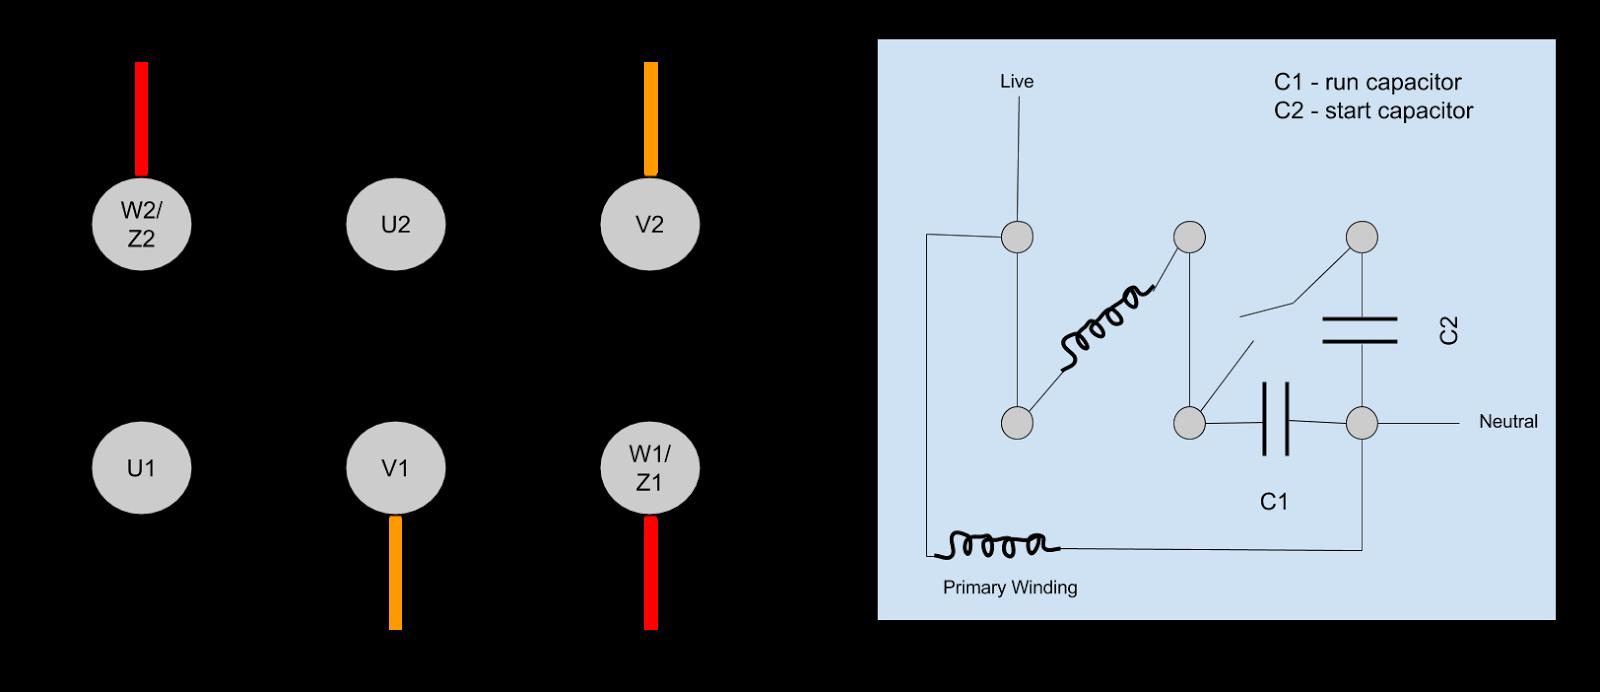 capacitor run motors diagrams capacitor run motor diagram usbmodels co